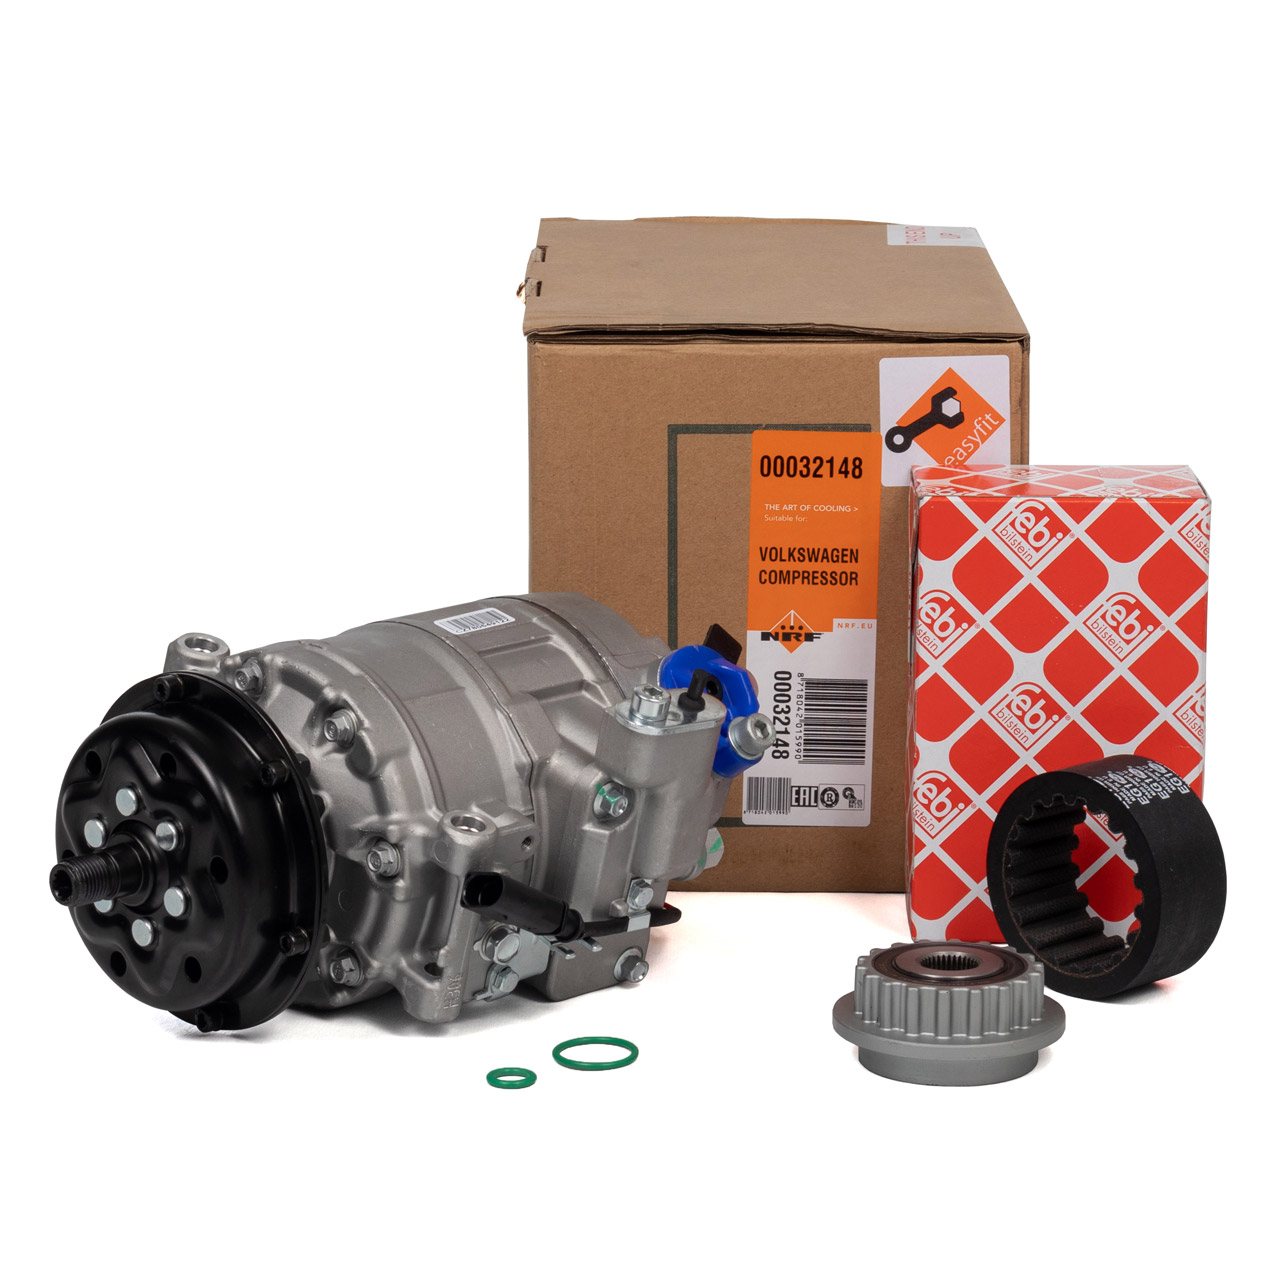 NRF Kompressor Klimaanlage + FEBI Riemenscheibe VW Phaeton T5 Touareg 7L 2.5 TDI